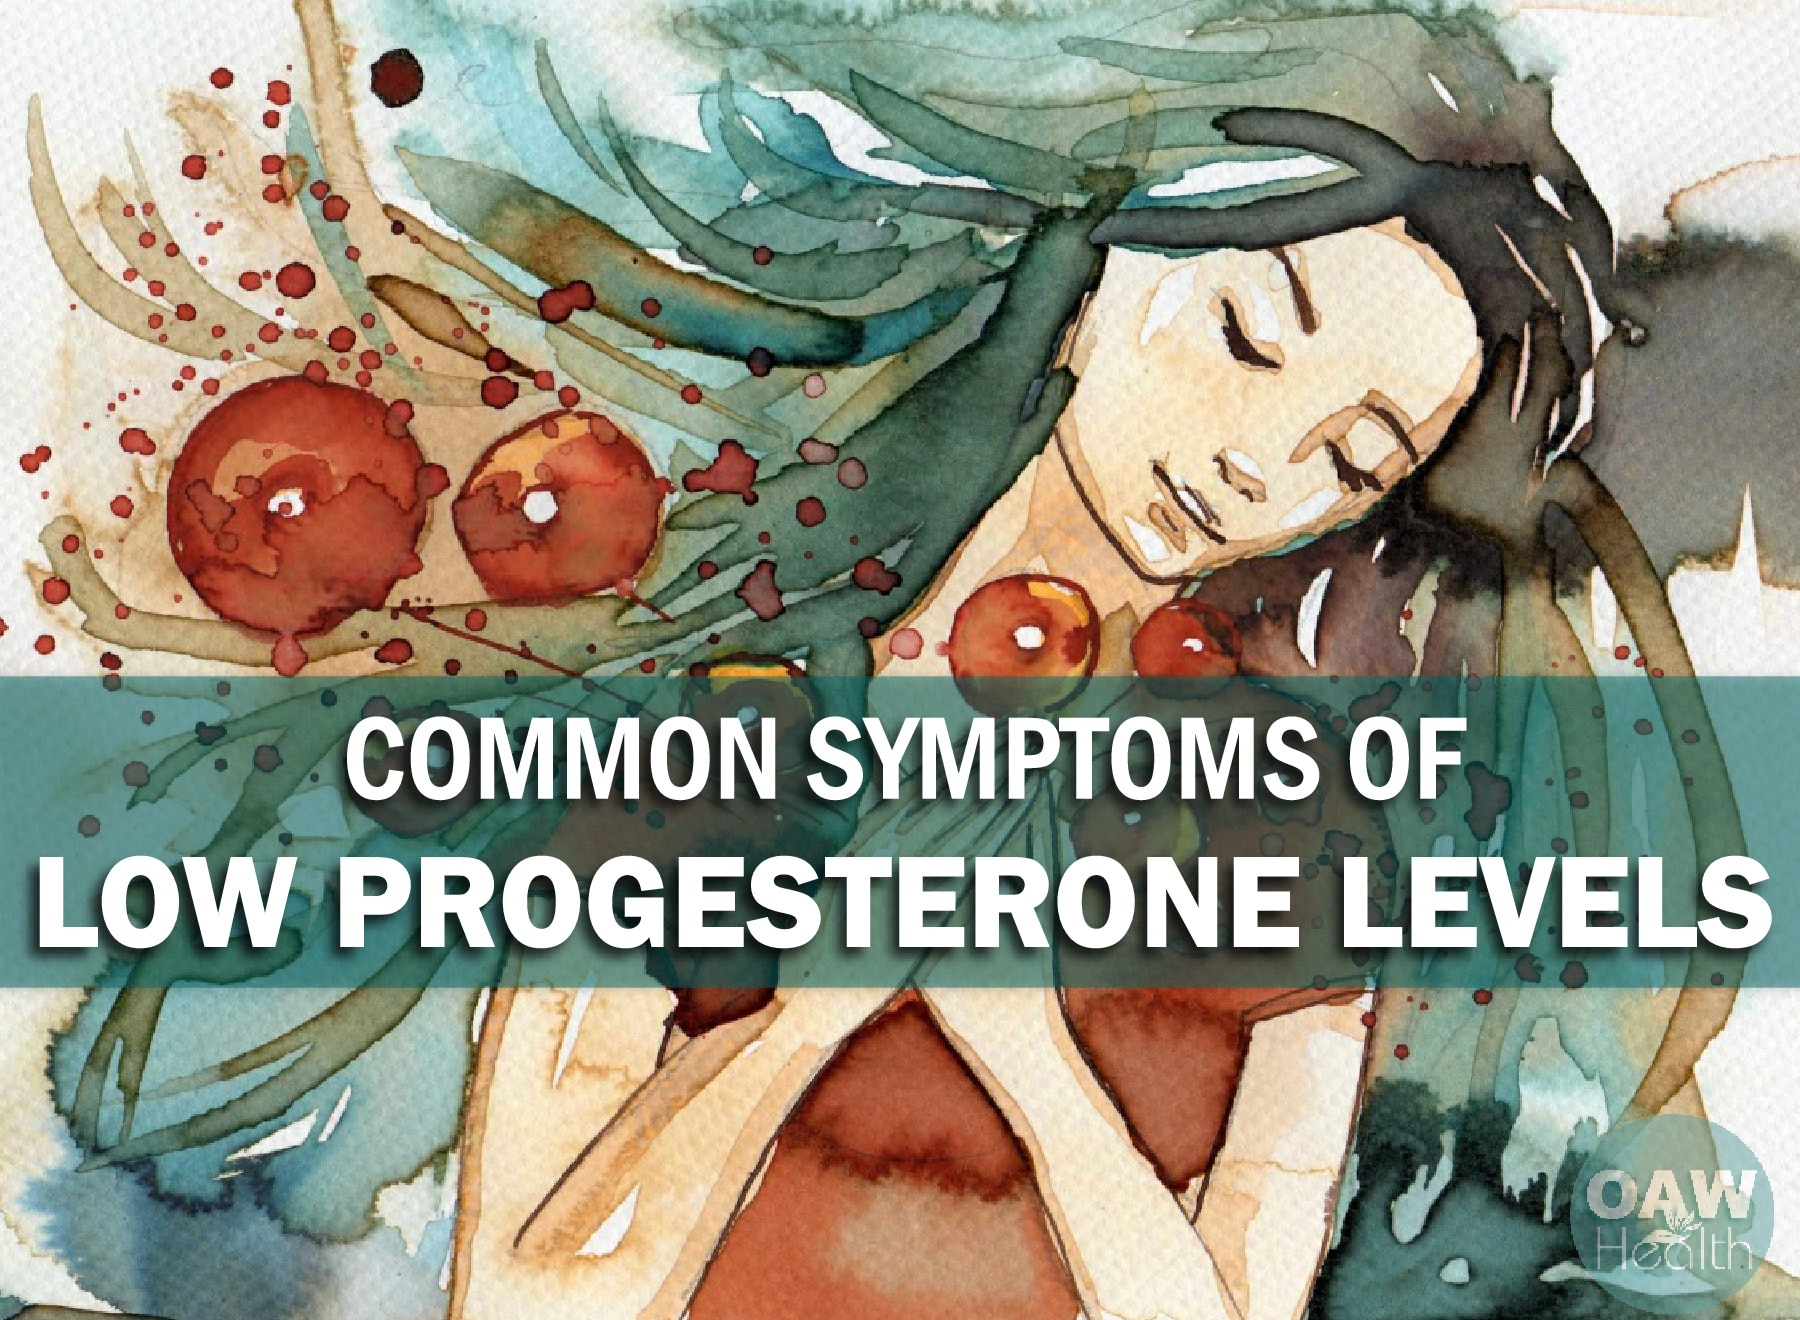 Common Symptoms of Low Progesterone Levels